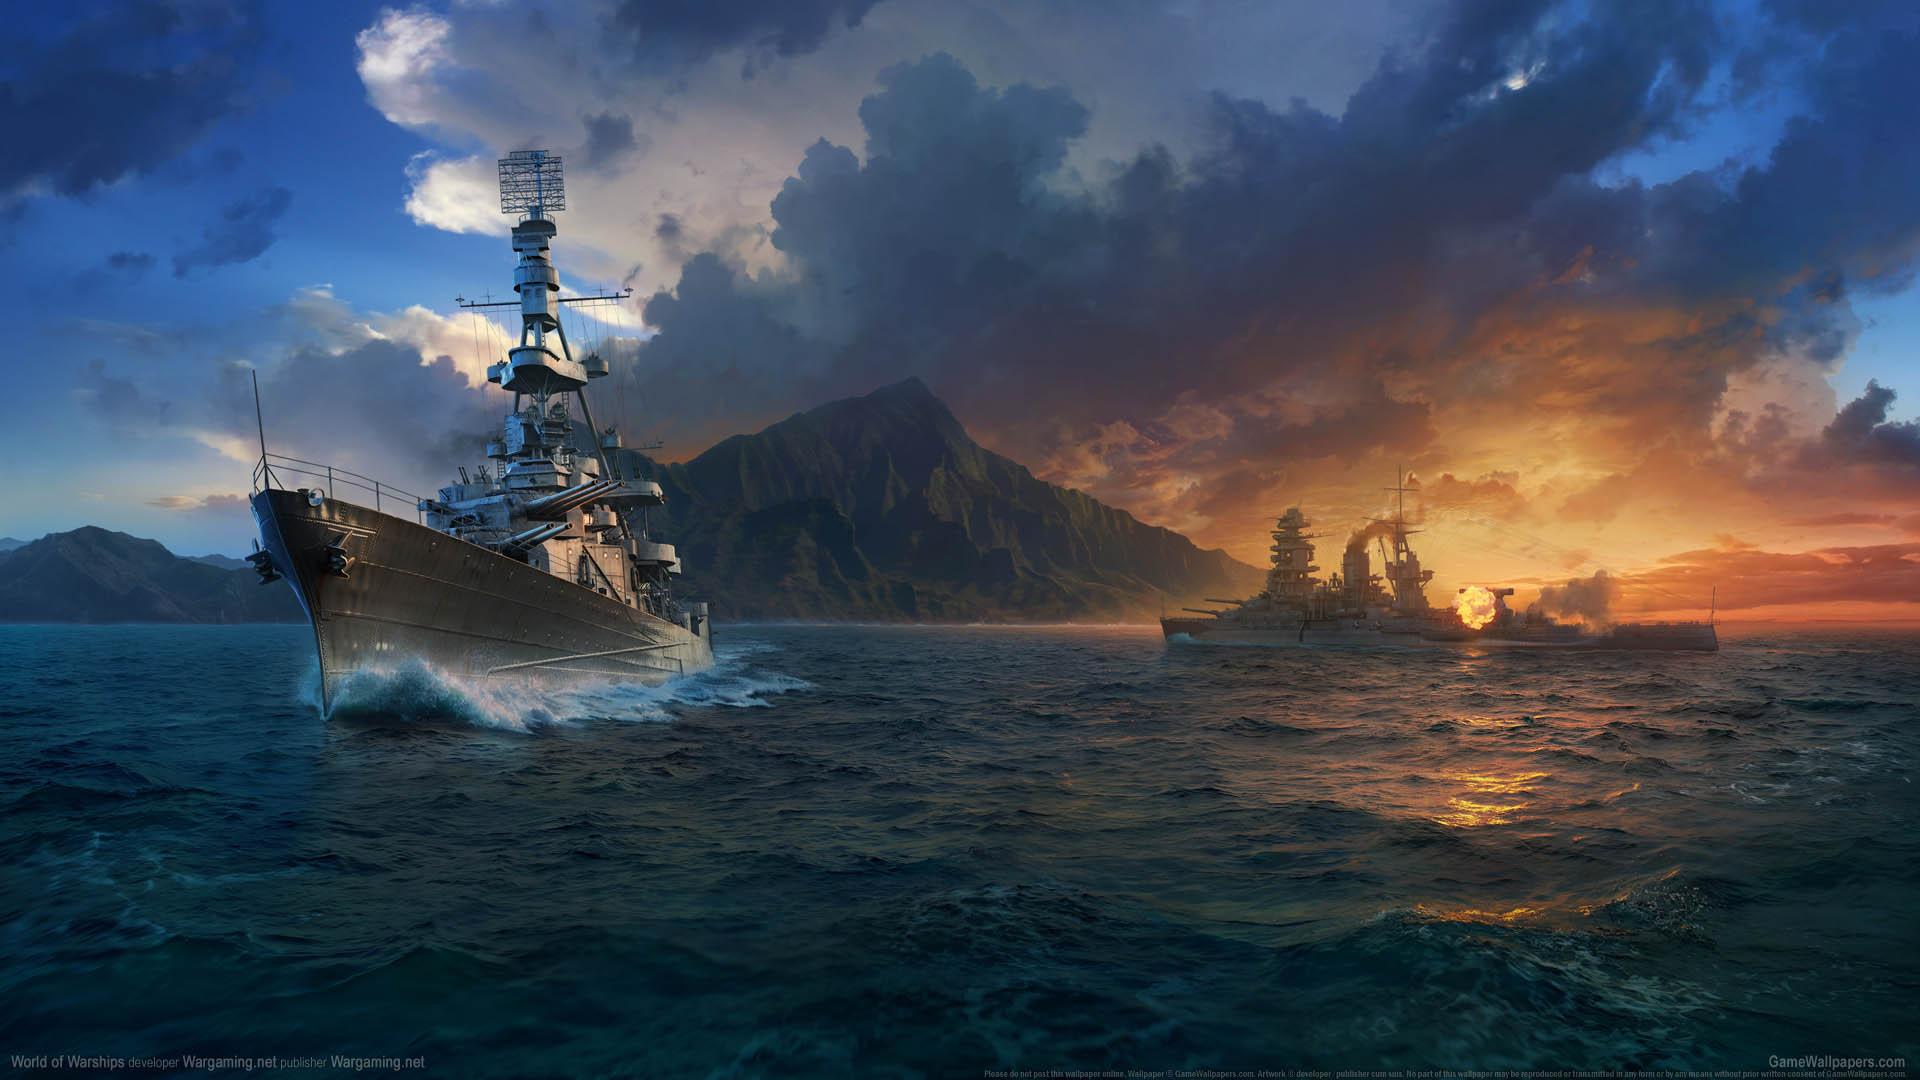 World of Warships wallpaper 11 1920x1080